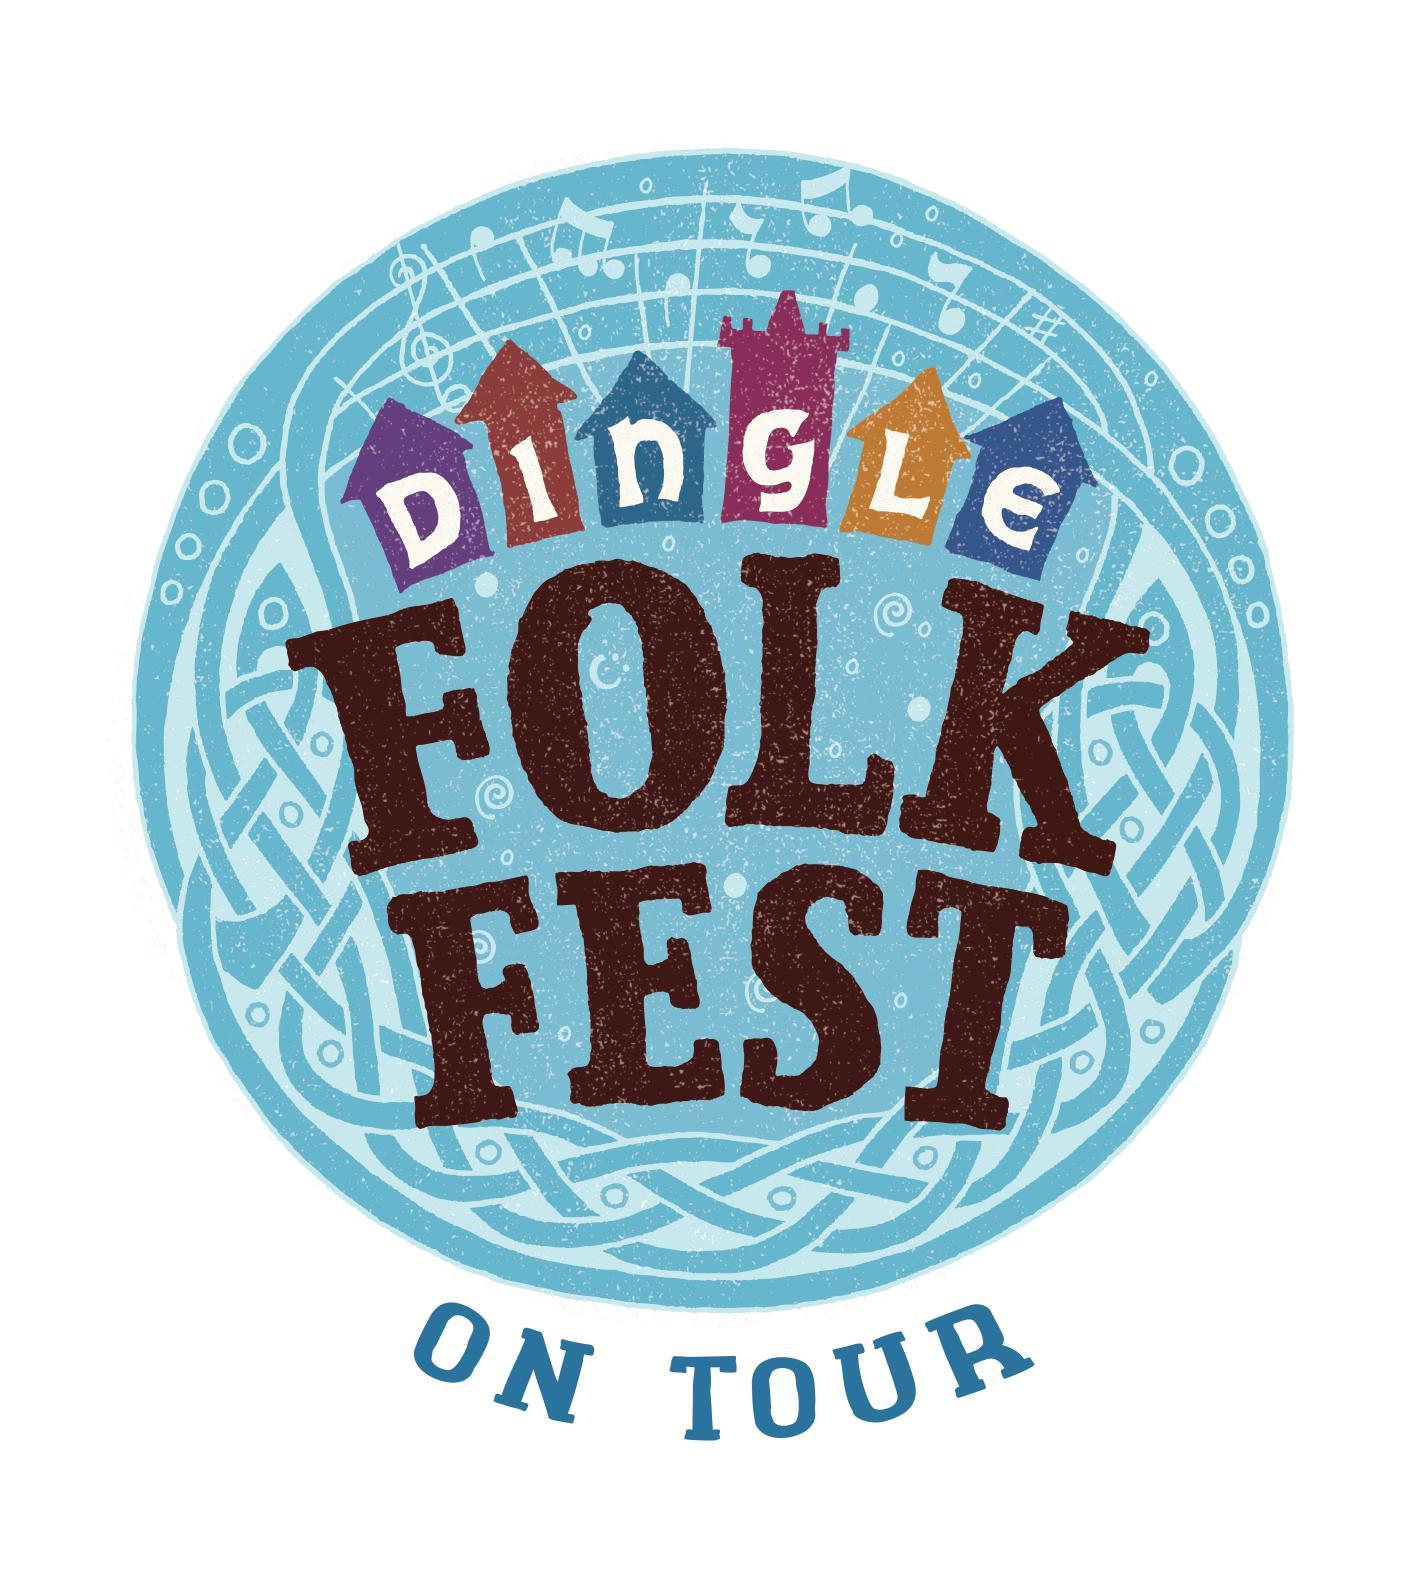 Dingle FolkFest on Tour